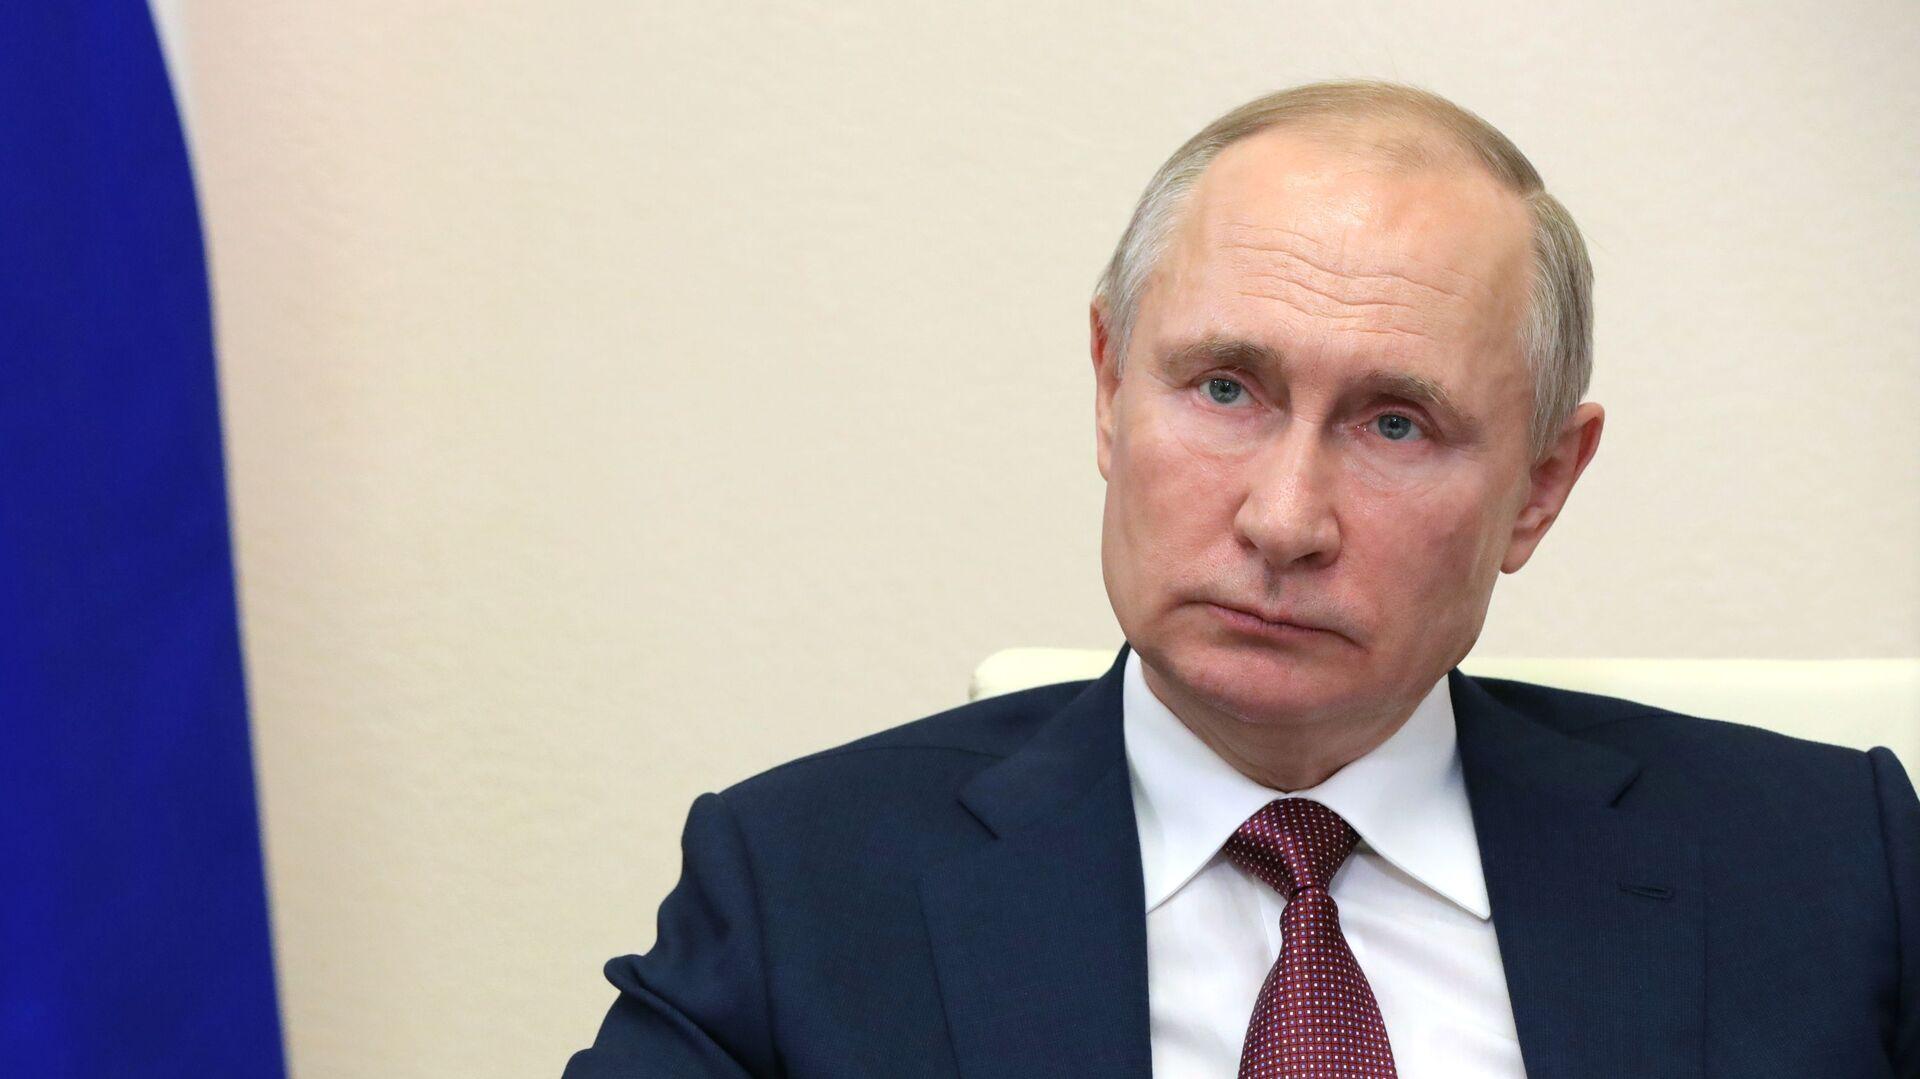 Vladímir Putin, presidente de Rusia - Sputnik Mundo, 1920, 27.03.2021